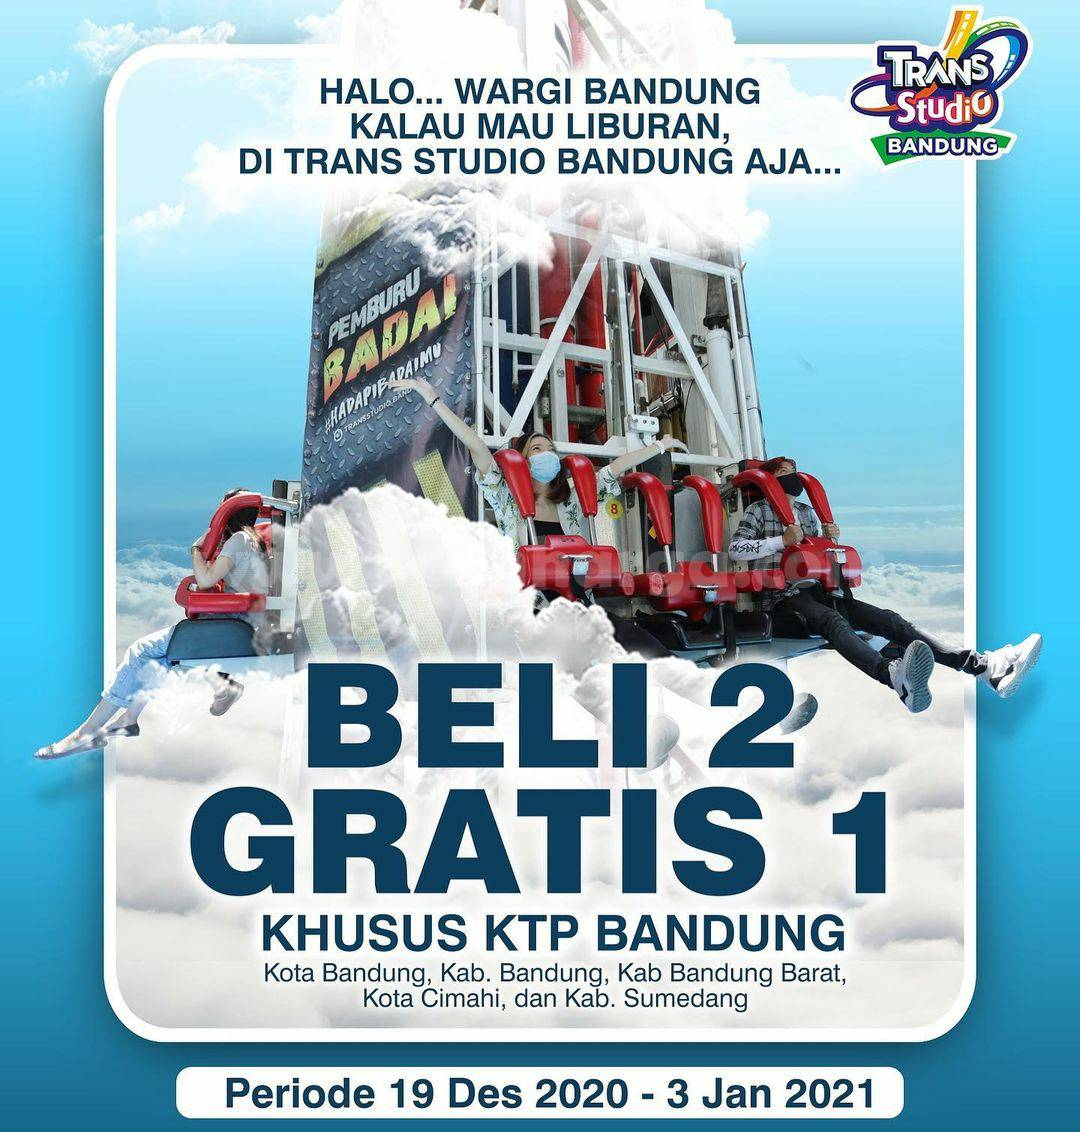 TRANS STUDIO BANDUNG Promo BELI 2 GRATIS 1 Khusus KTP Bandung